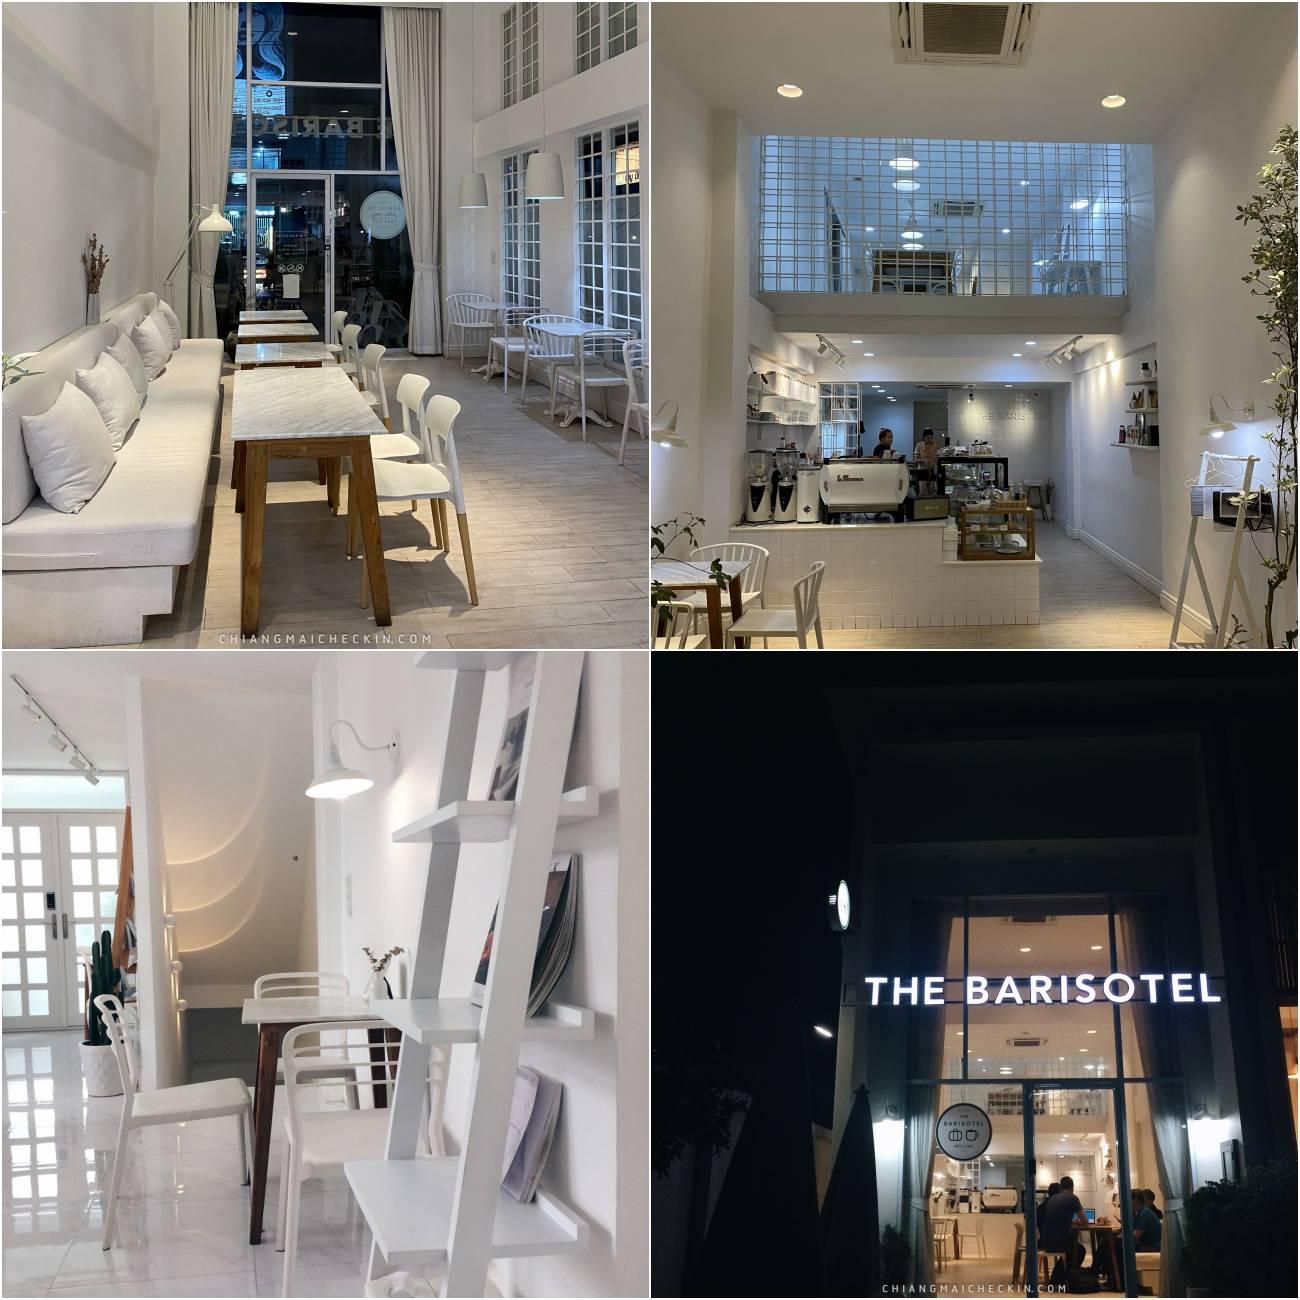 The Barisotel คาเฟ่ใจกลางเมืองเชียงใหม่ตกแต่งด้วยโทนสีขาว ขนมและกาแฟอร่อย บรรยากาศดียยย์